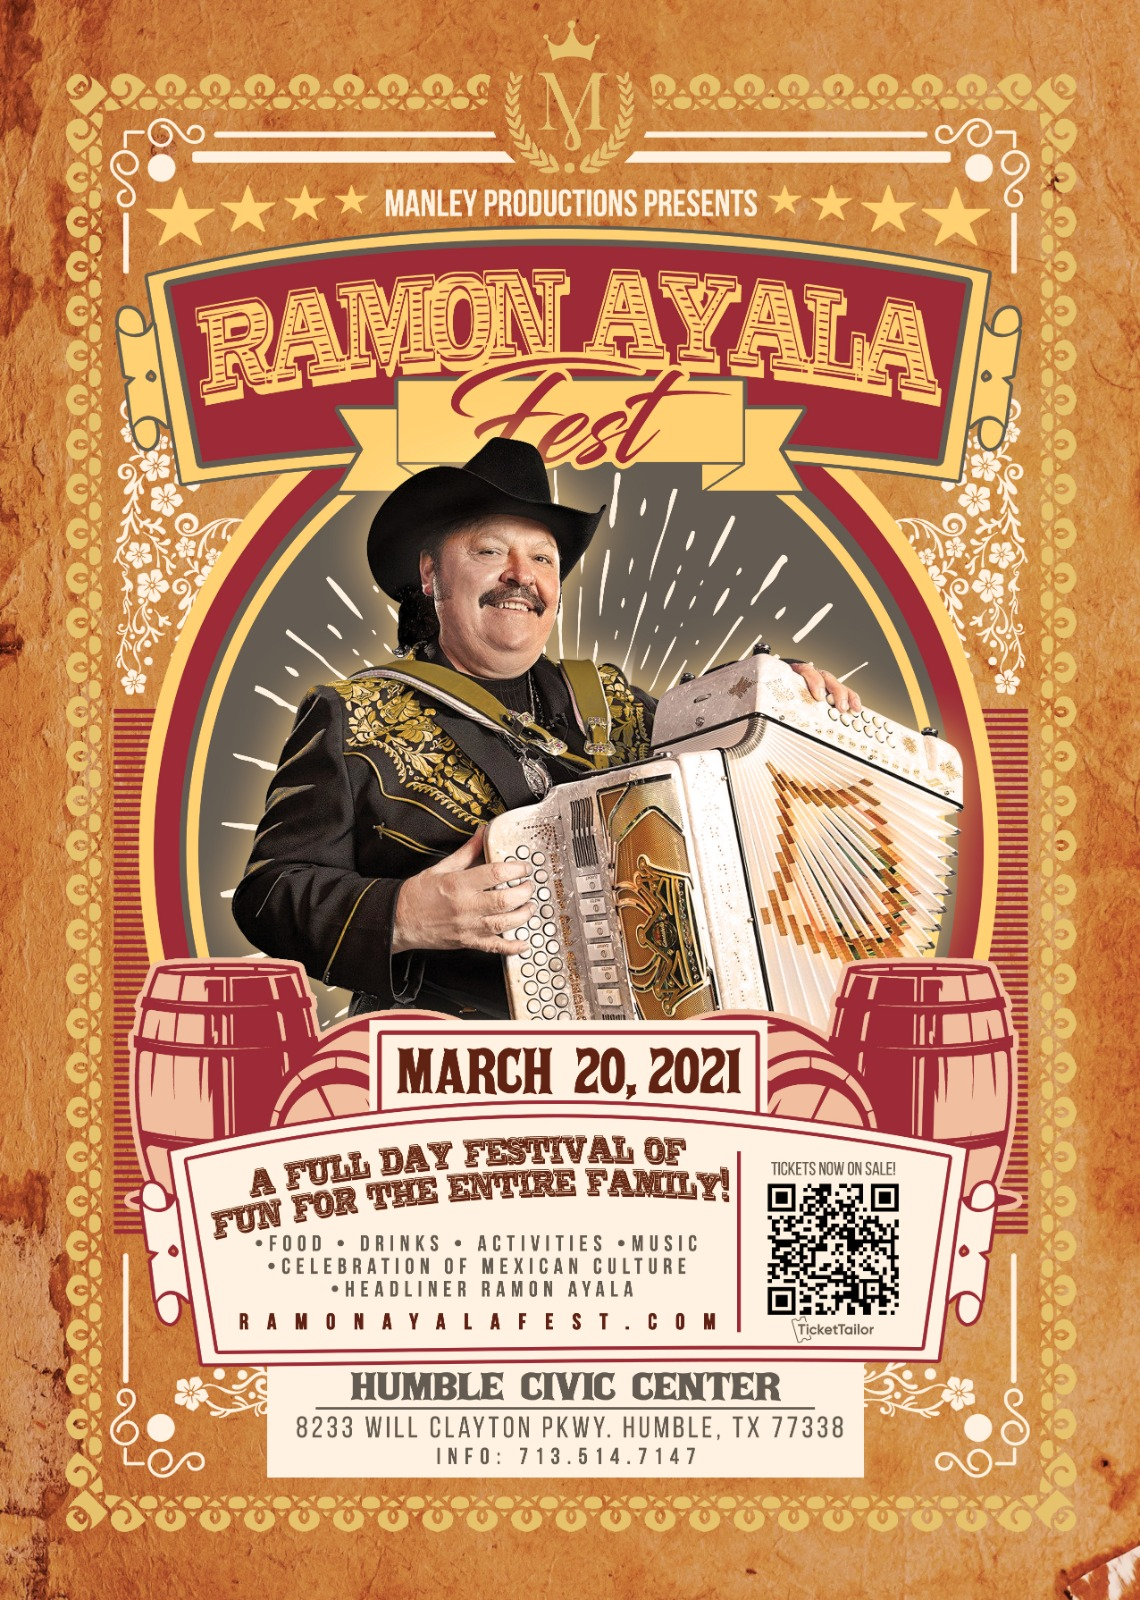 RAMON AYALA FEST